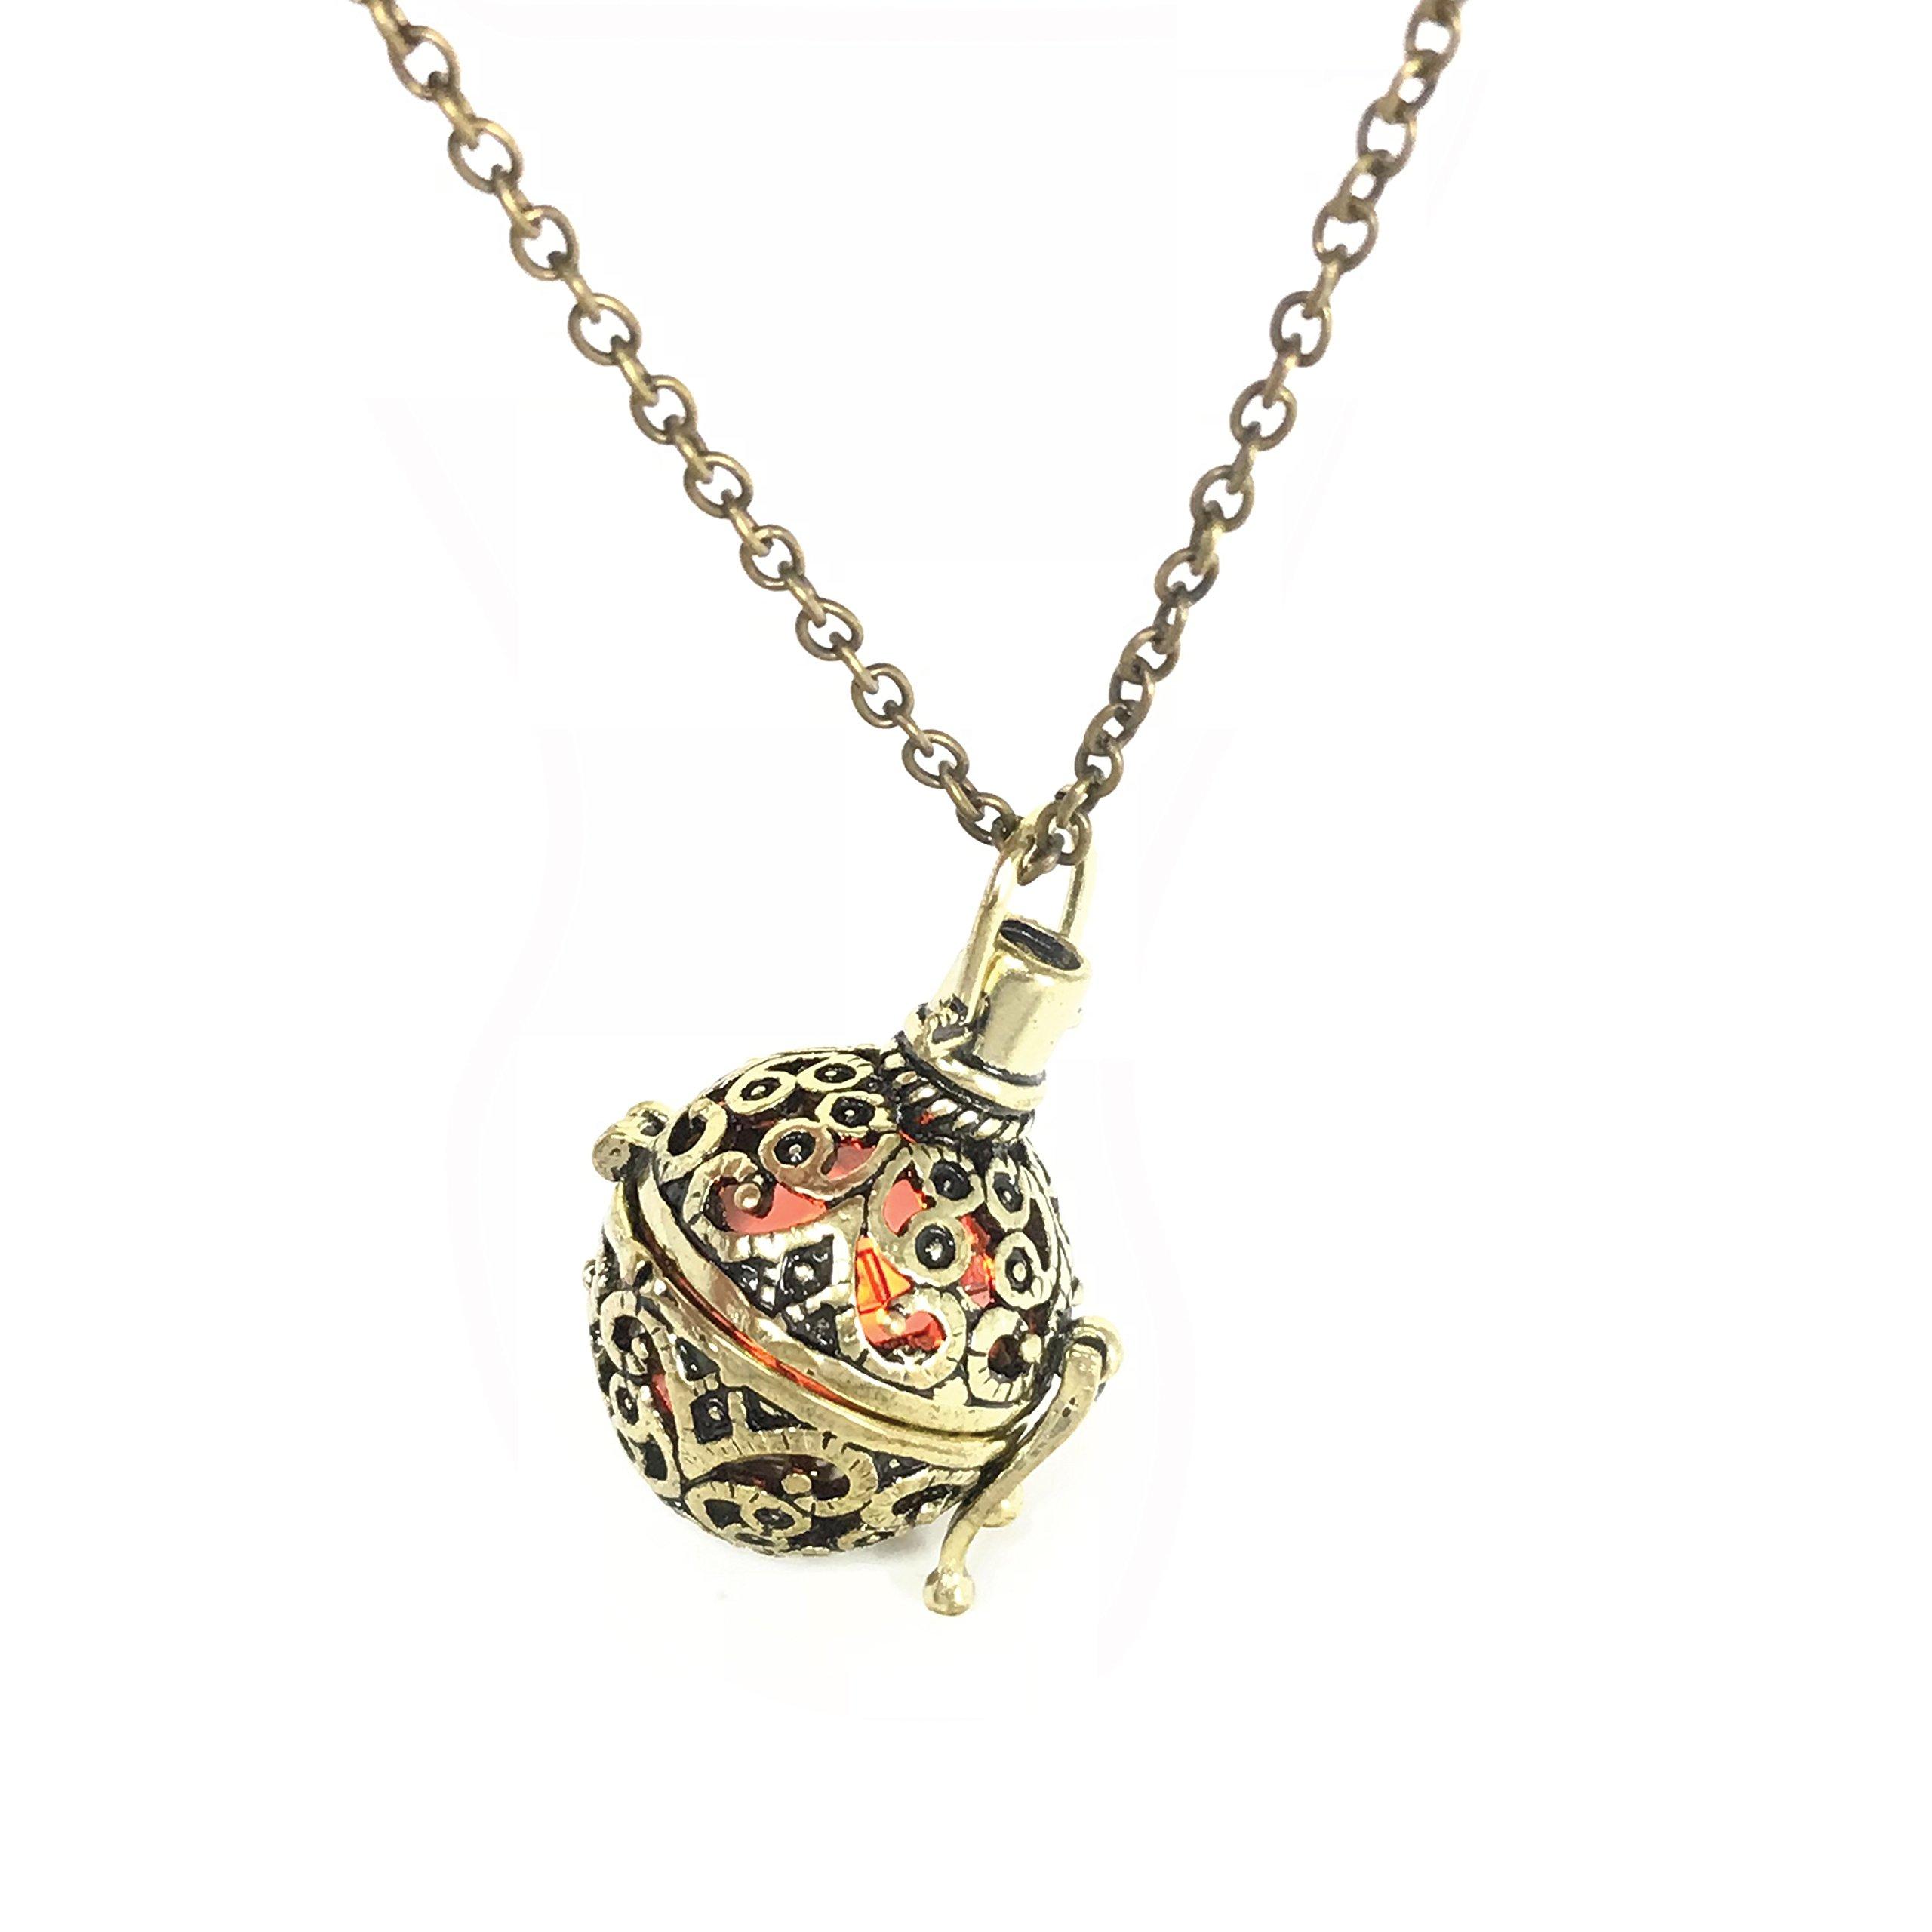 UMBRELLALABORATORY Steampunk Pendant Locket Necklace | Handmade Glow in the Dark Accessory